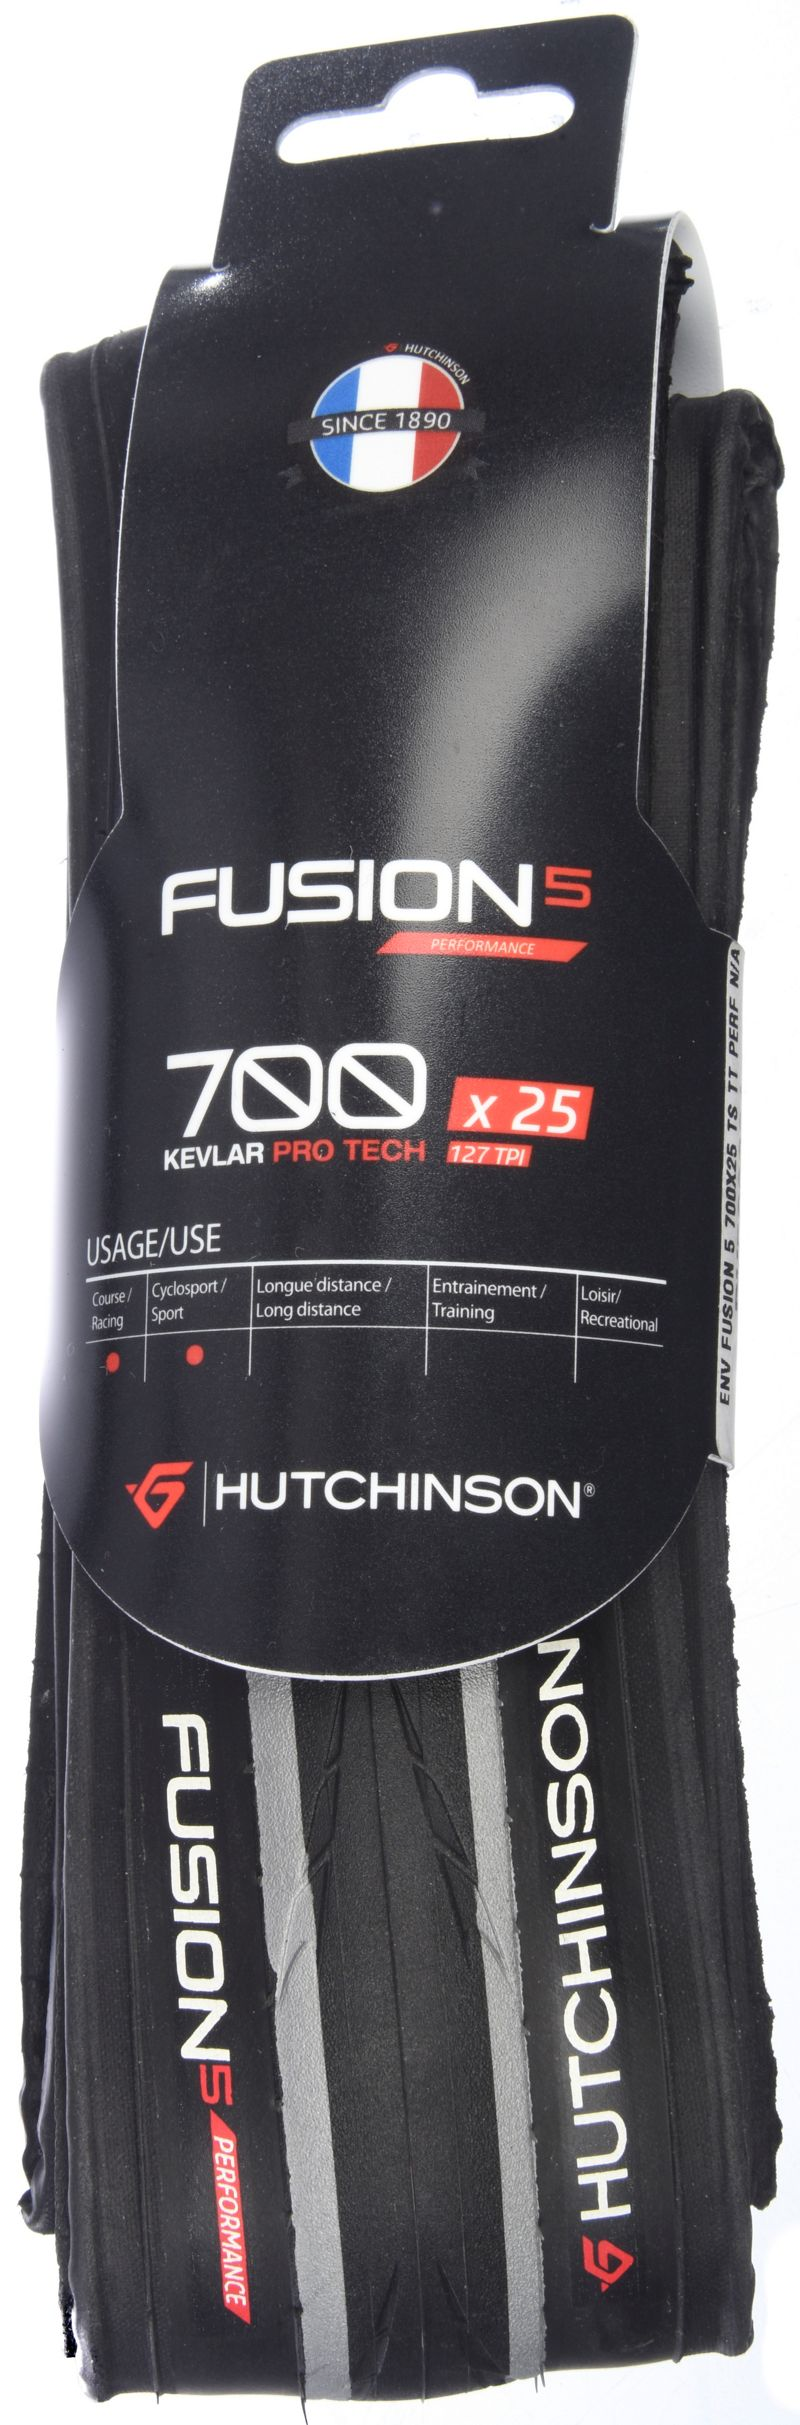 Hutchinson Fusion 5 Kevlar Pro ロードタイヤ 2017